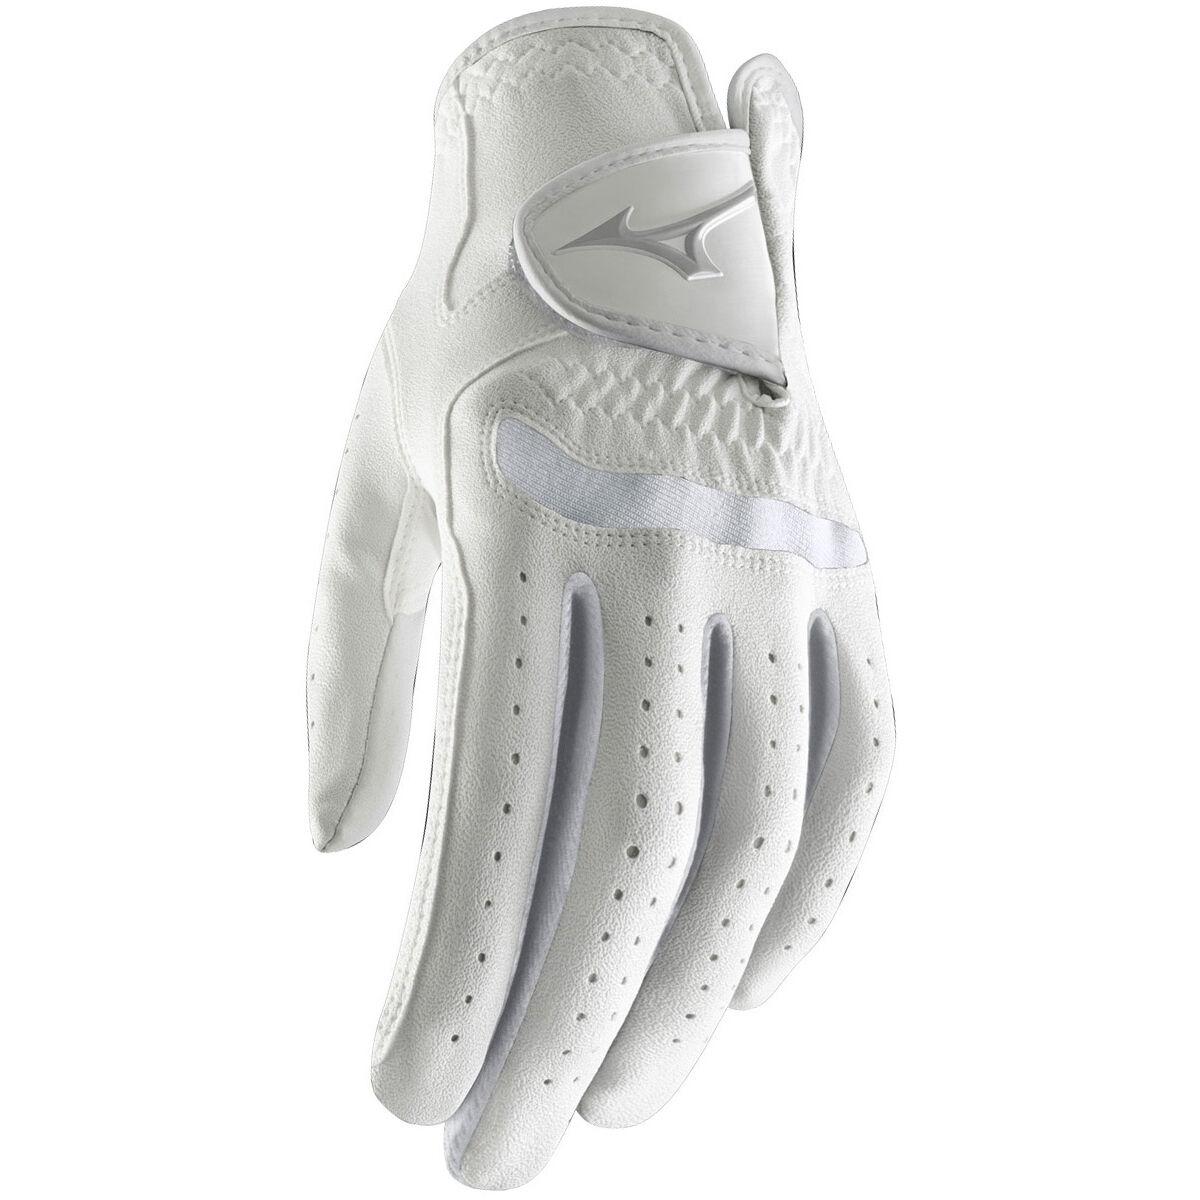 Mizuno Golf Comp Womens Golf Glove, Female, Left hand, Small, White   American Golf